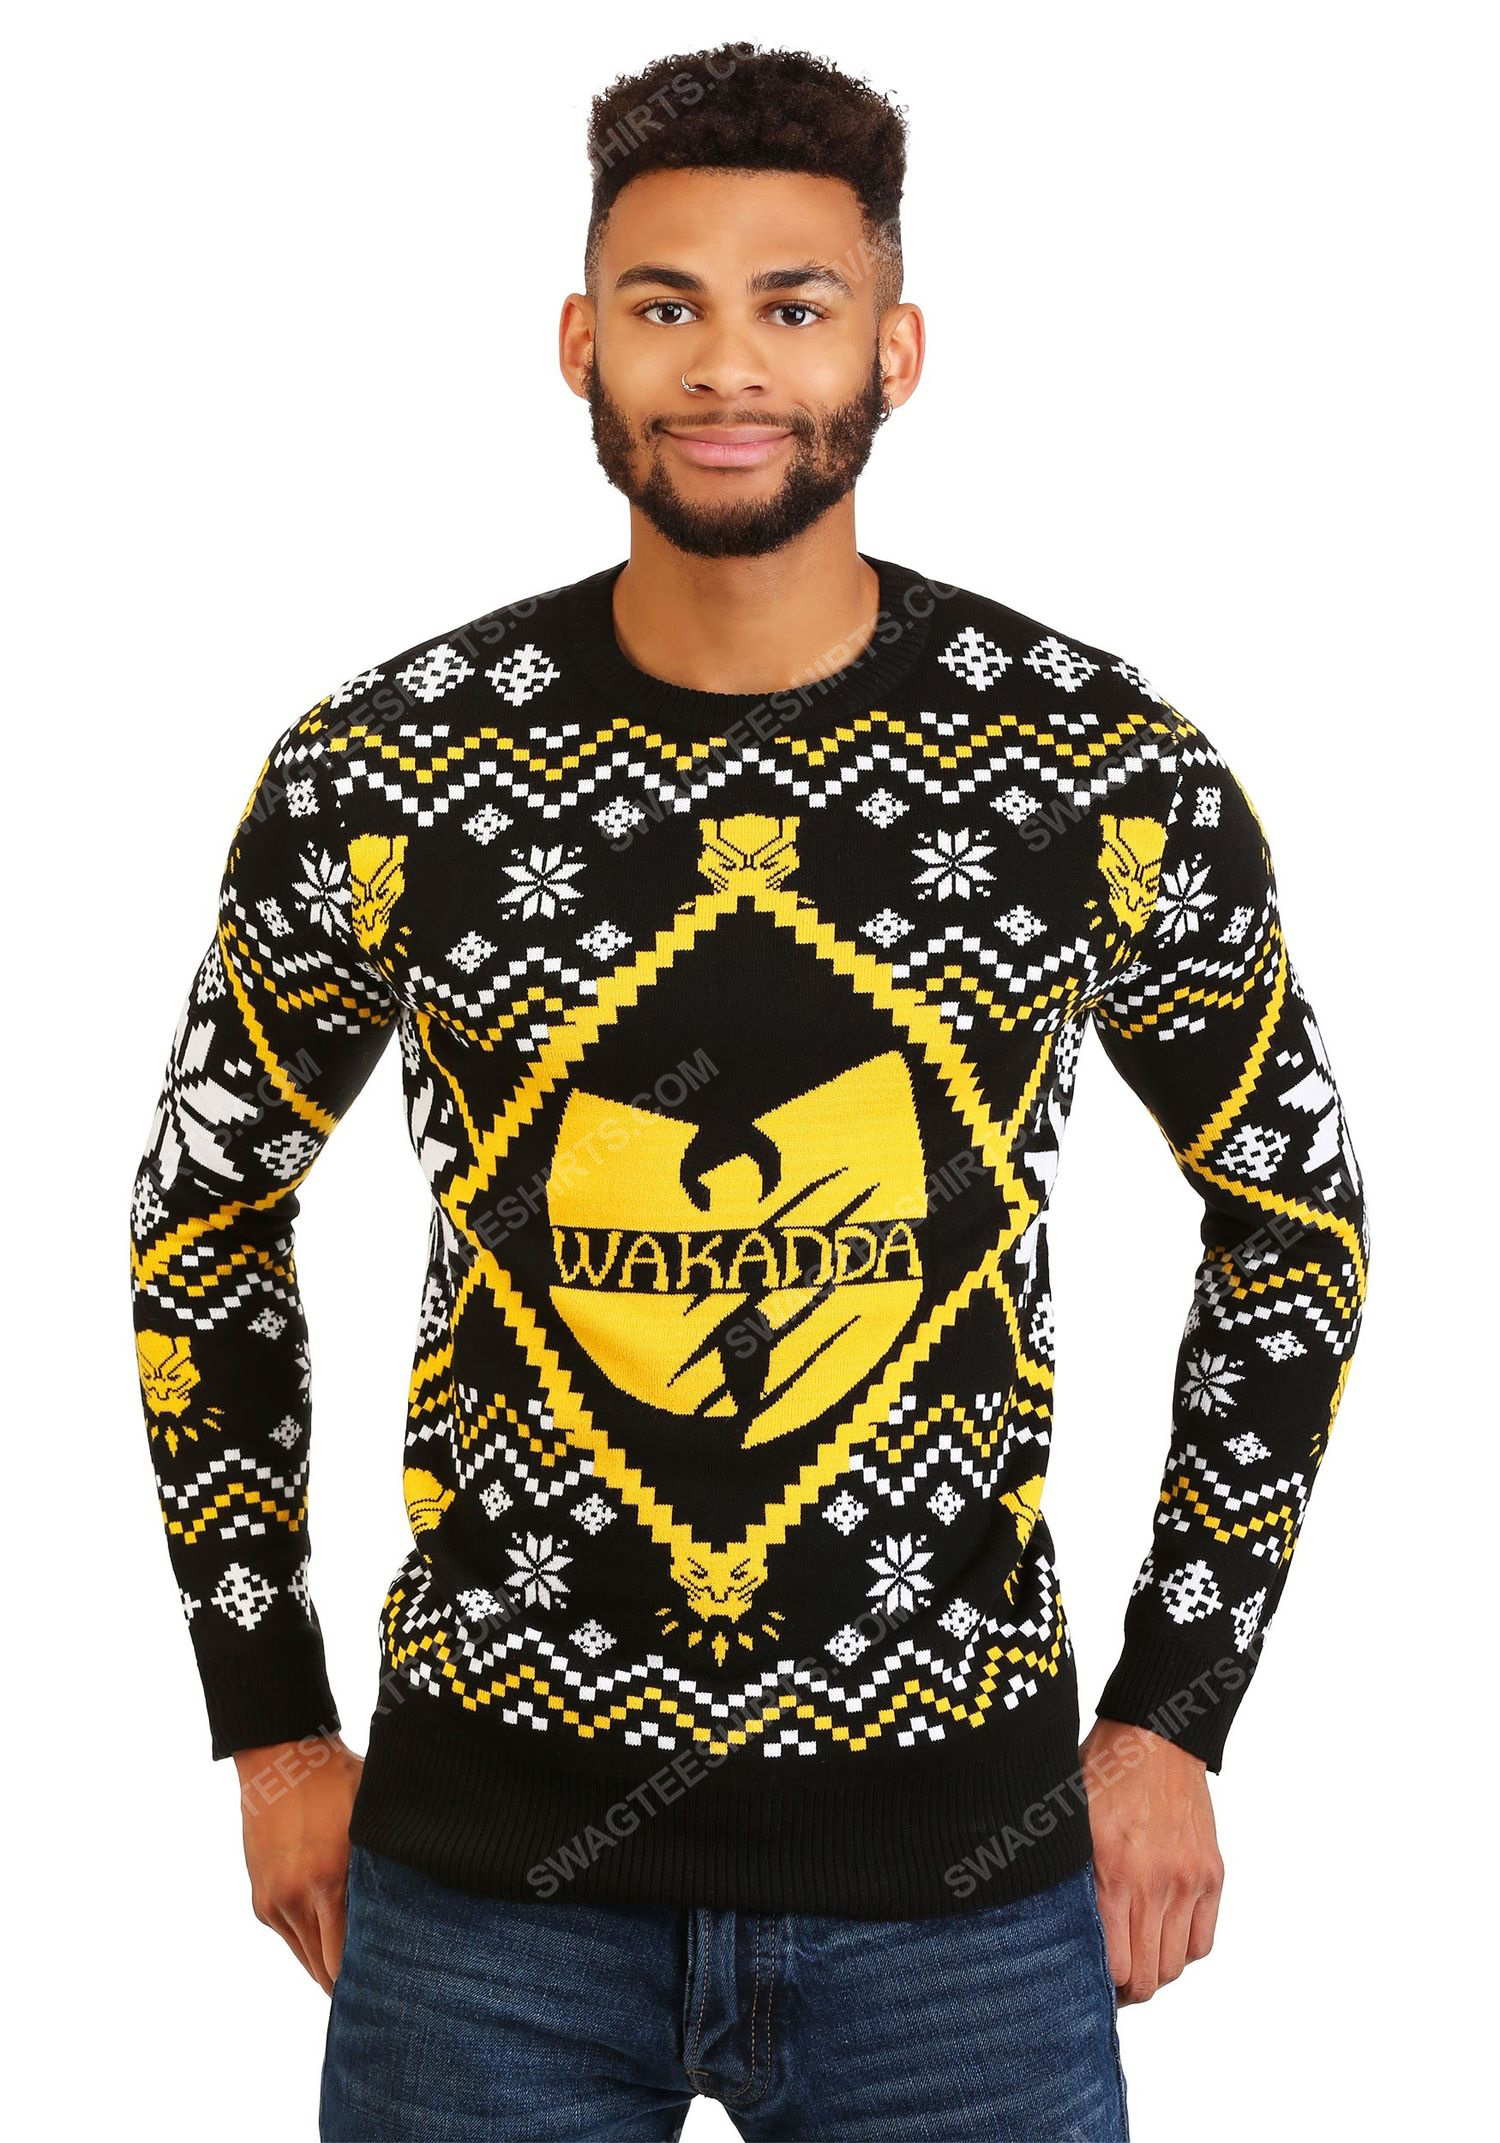 Wu tang clan black panther wakanda ugly christmas sweater 2 - Copy